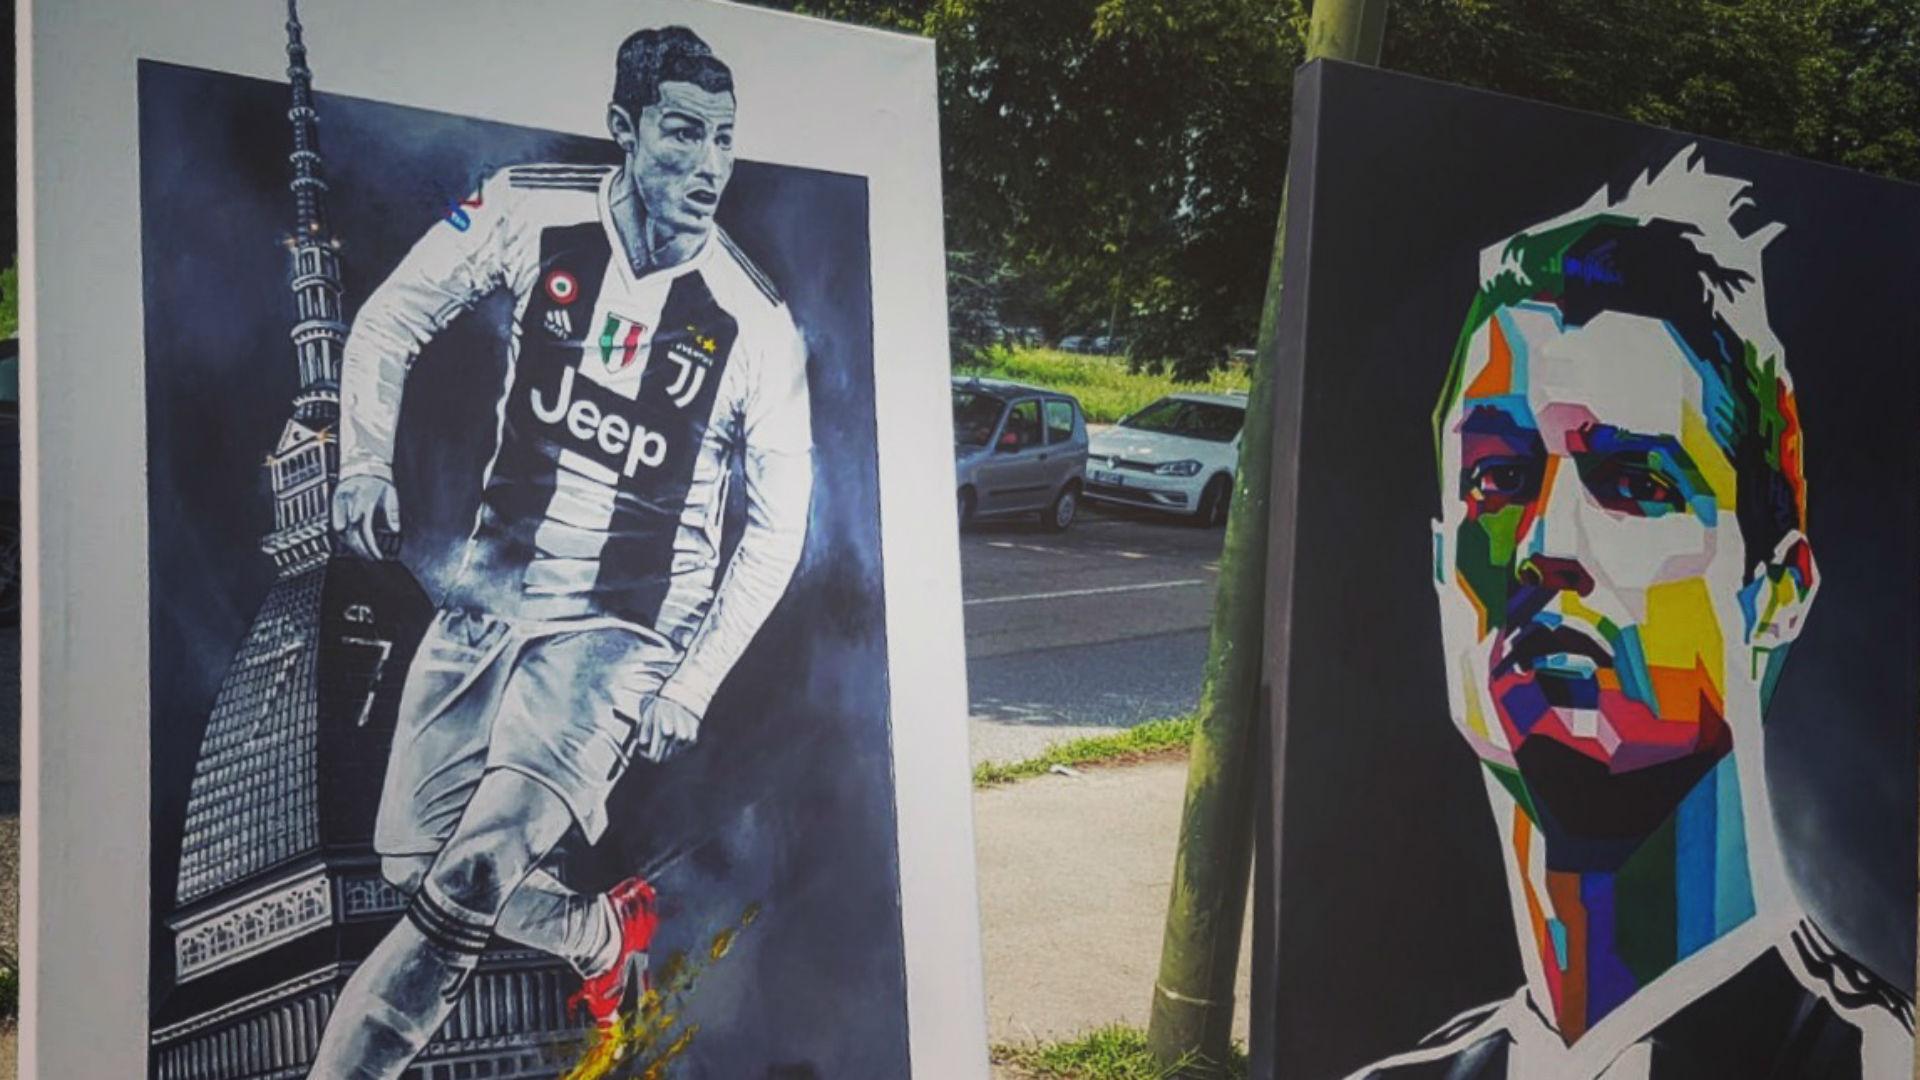 Juventus, bagno di folla per Ronaldo e Dybala: sorrisi e autografi